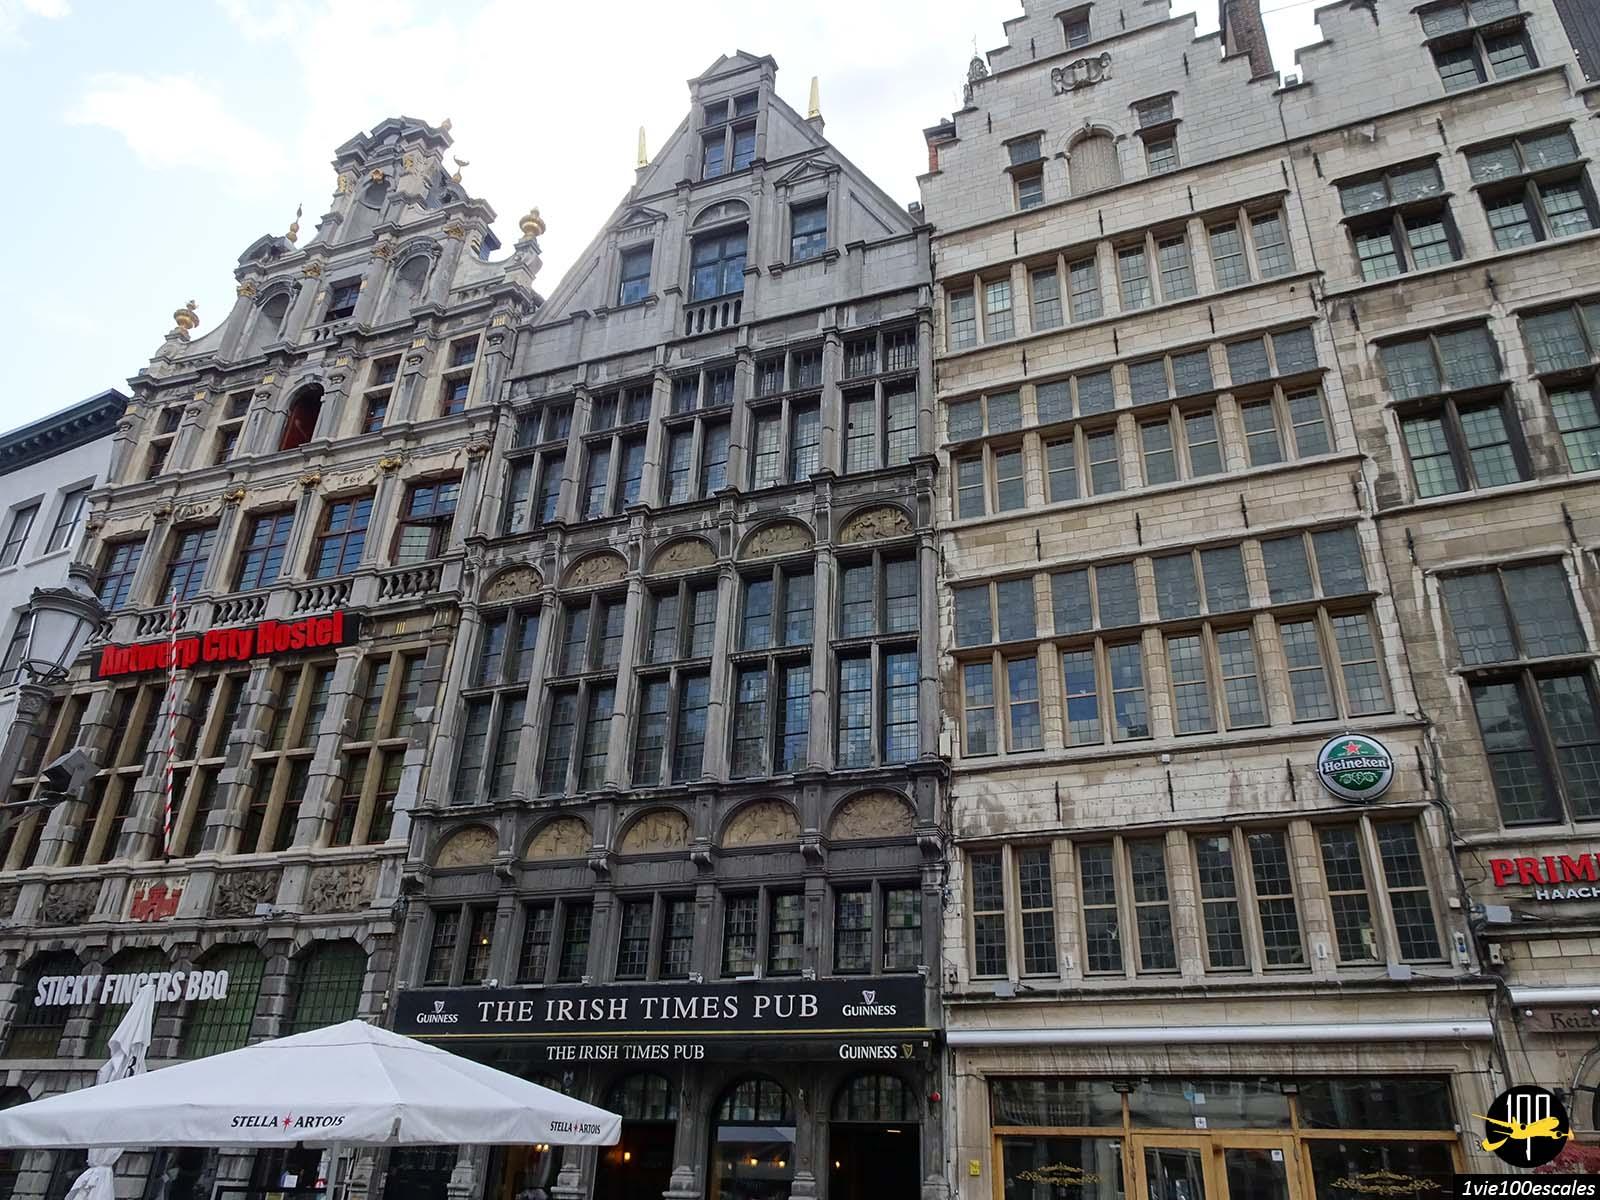 Les belles façades en brique dans les rues d'Anvers